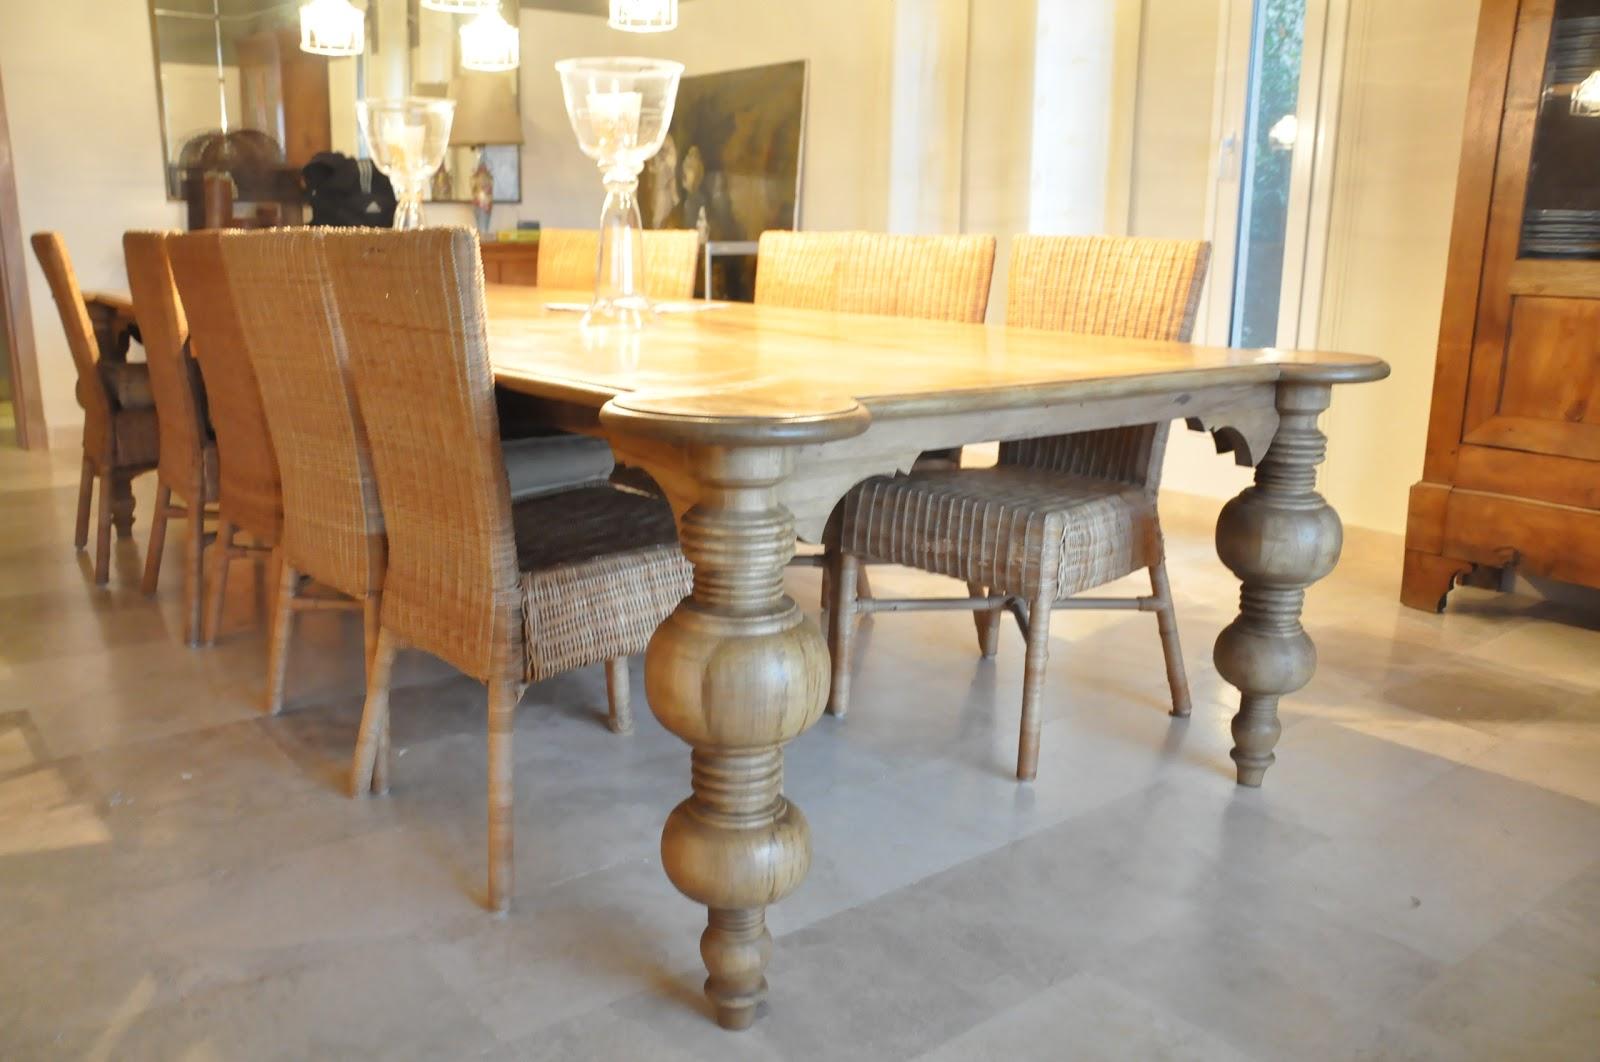 Muebles patchwork ruta 27 n 5707 rincon de milberg - Patas madera para mesas ...